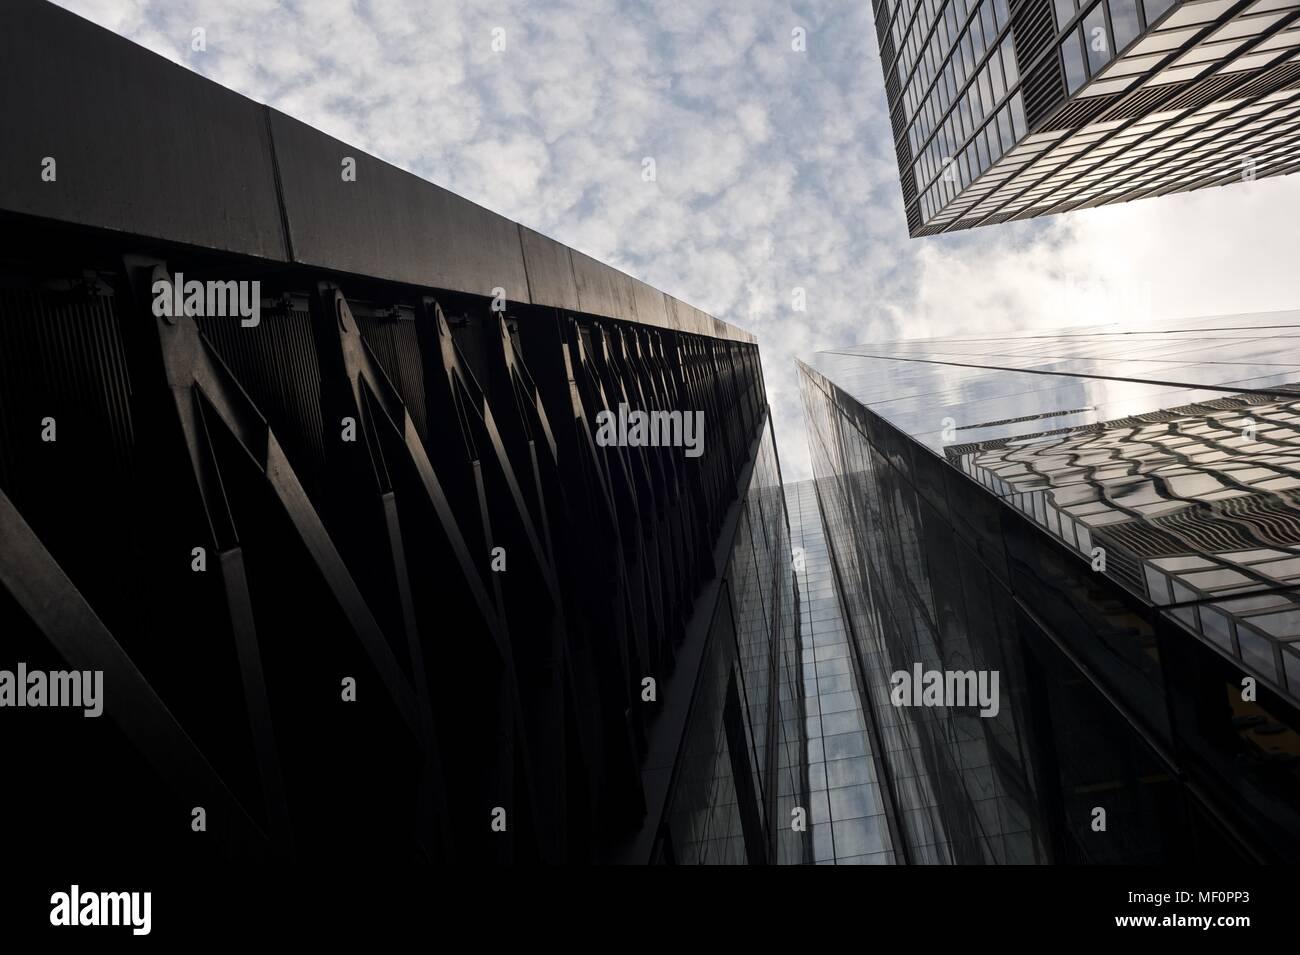 London's ever growing list of sky scrapers - Stock Image